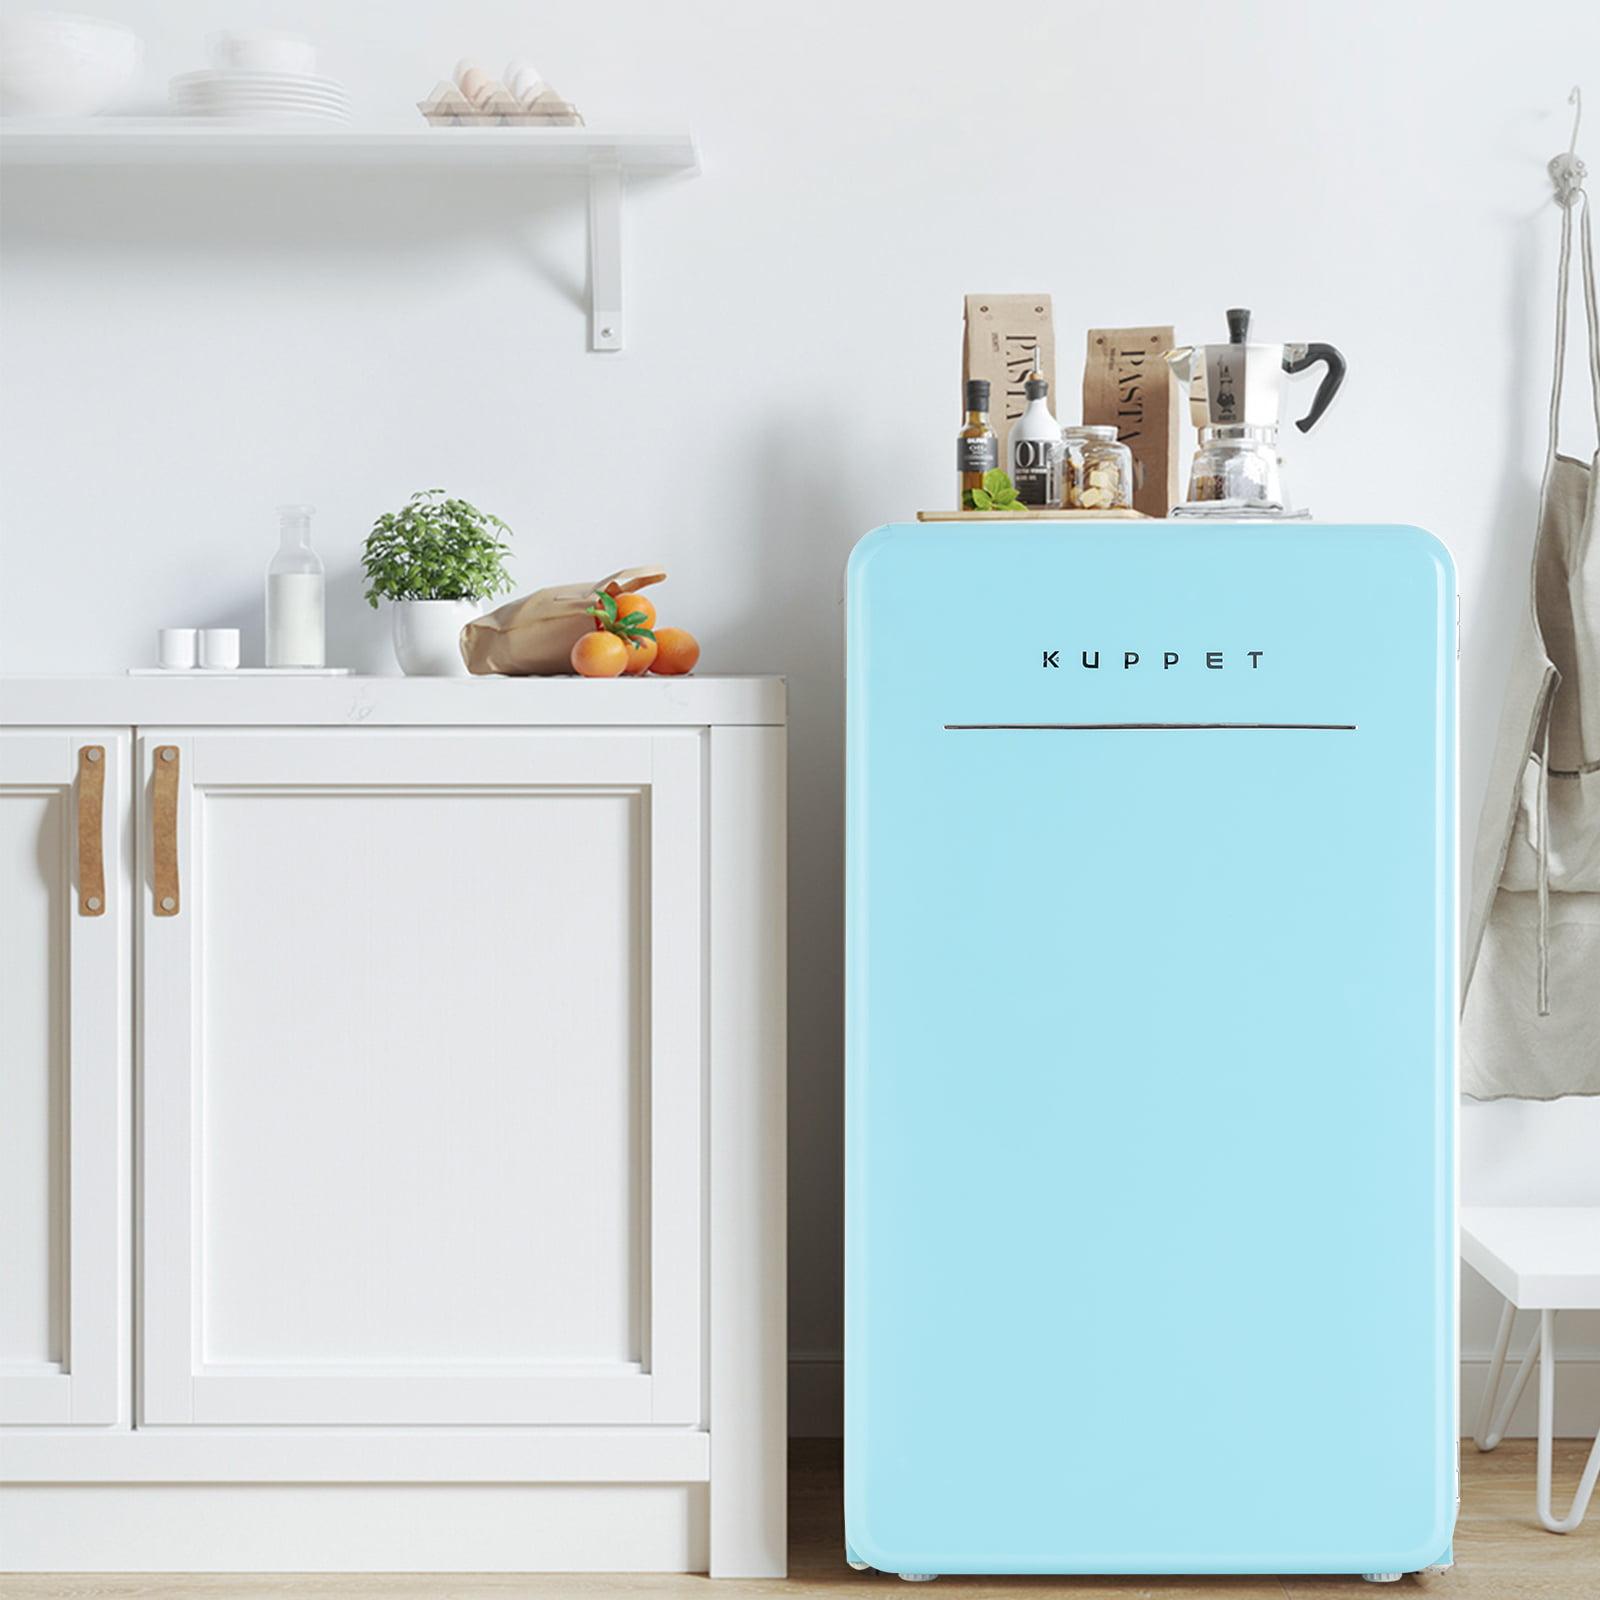 Kuppet Retro Mini Fridge Compact Refrigerator With Covered Chiller Compartment For Dorm Garage Camper Basement Or Office Adjustable Removable Glass Shelves 3 2 Cu Ft Walmart Com Walmart Com